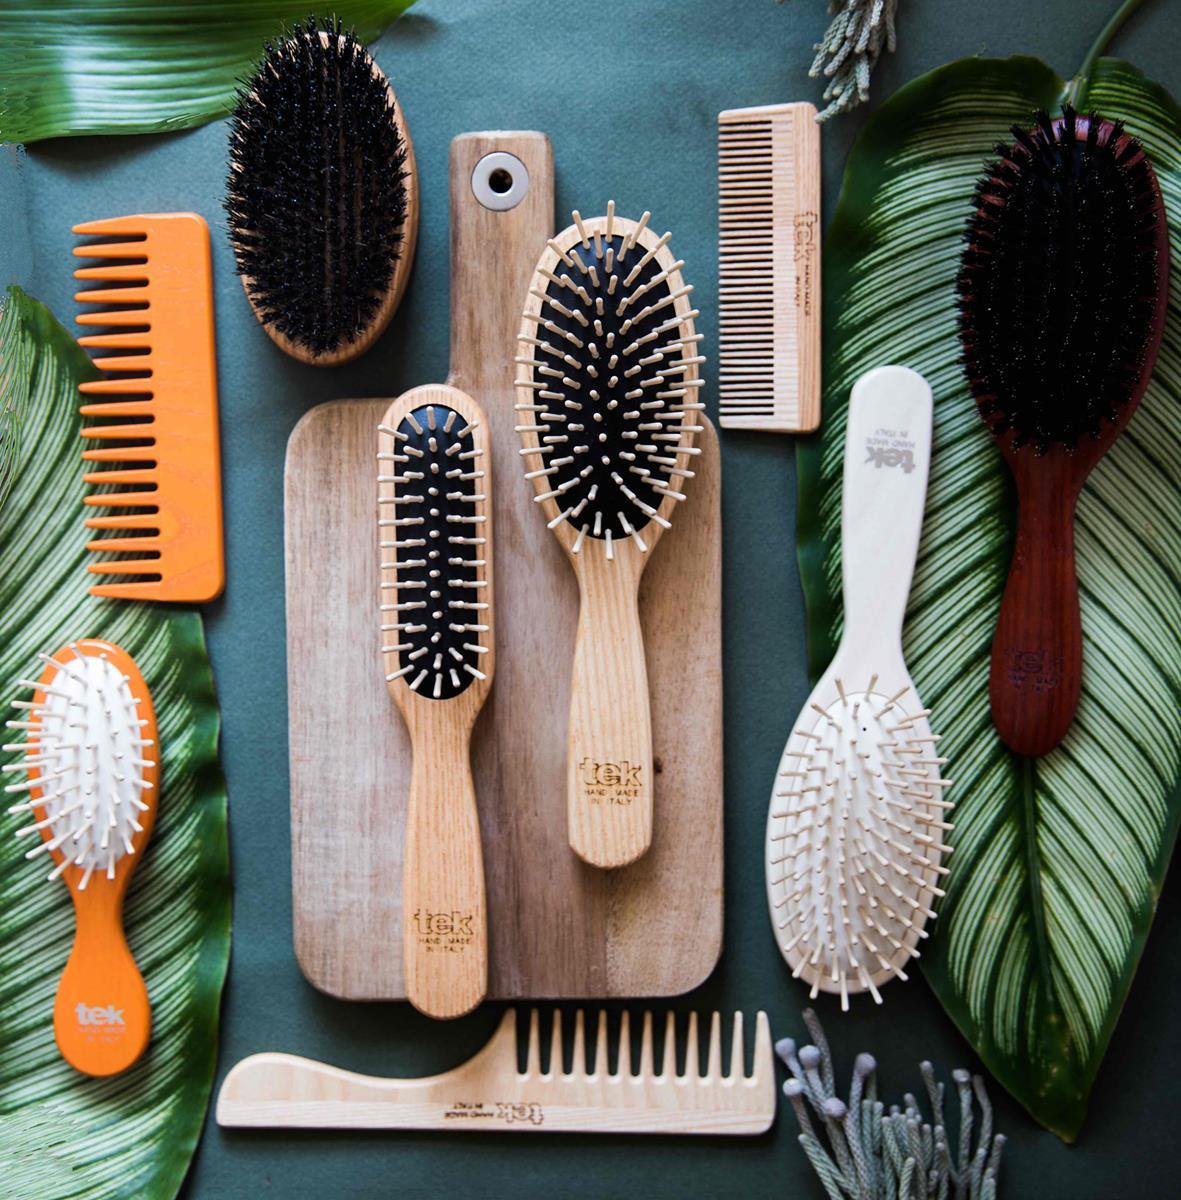 tek prodotti per capelli sani e splendenti